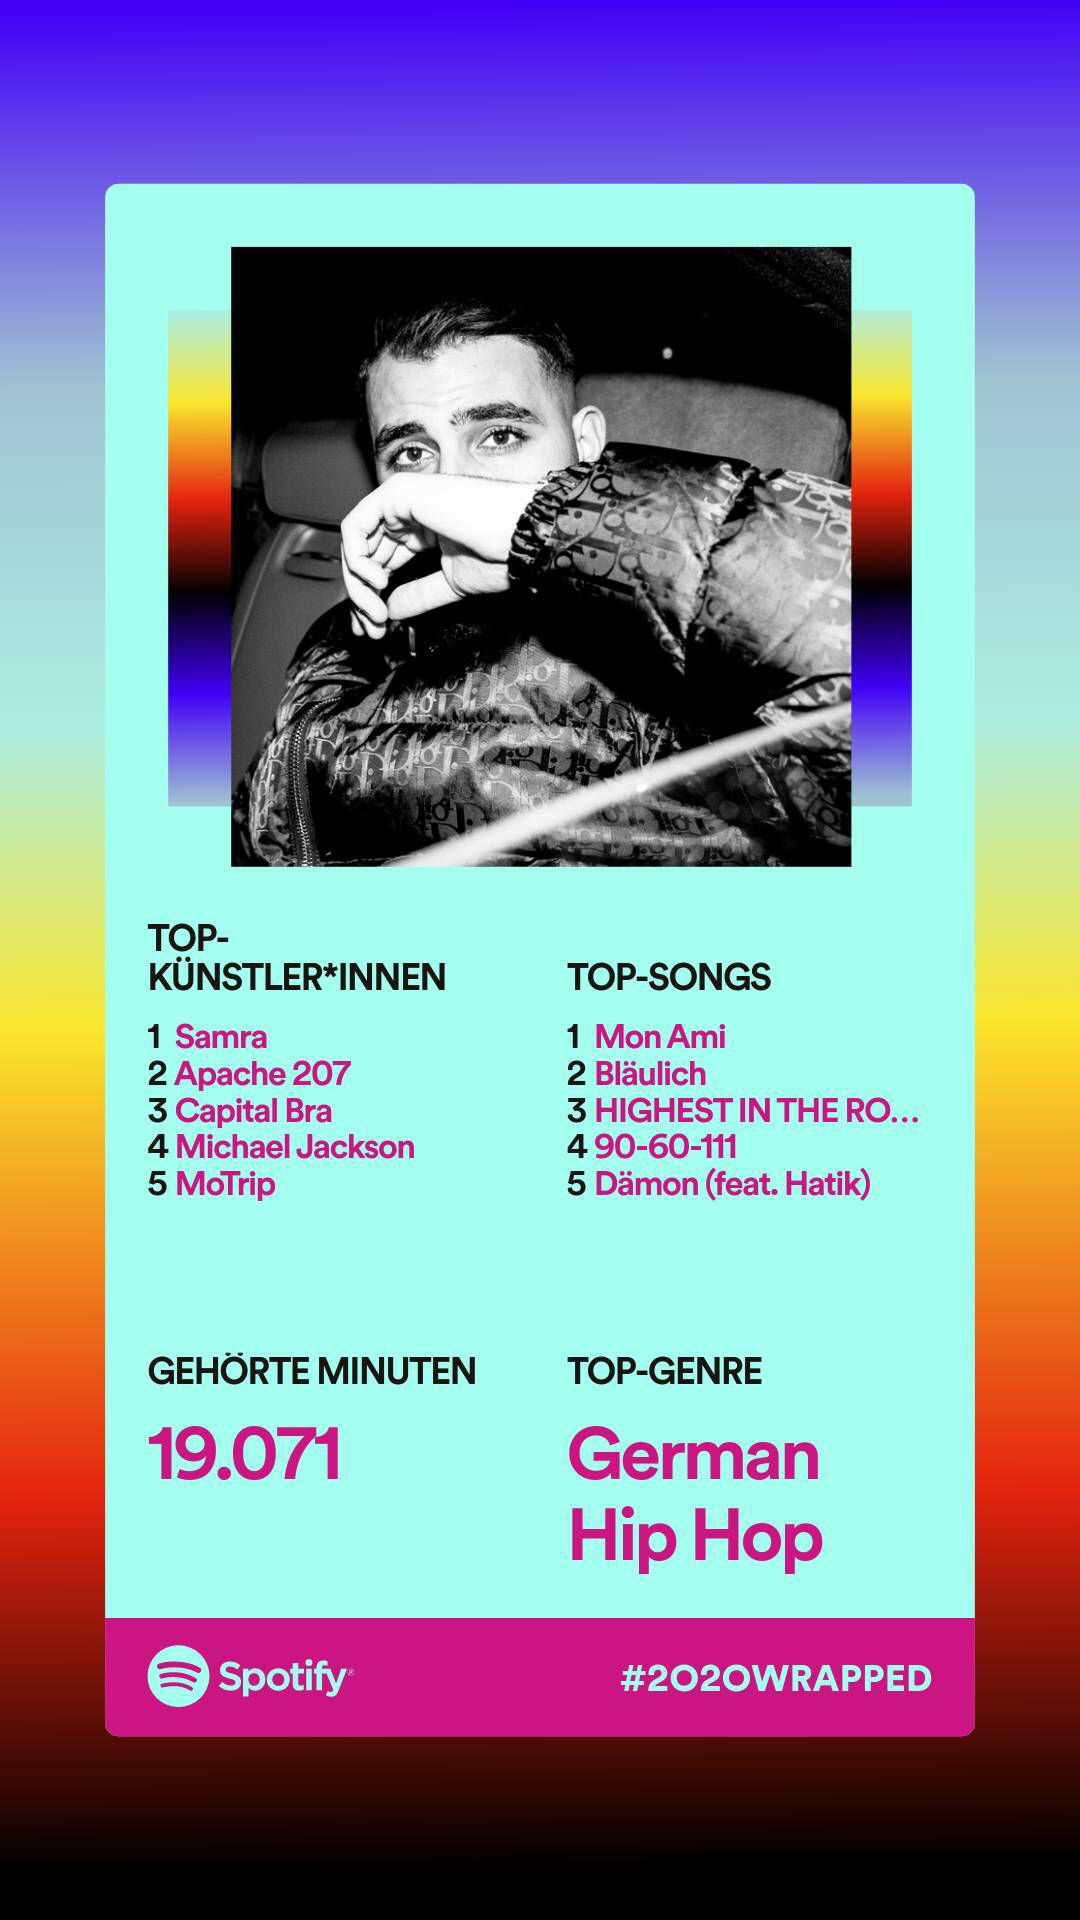 Pin By Elif Caliskan On Spotify Spotify Songs Wrap